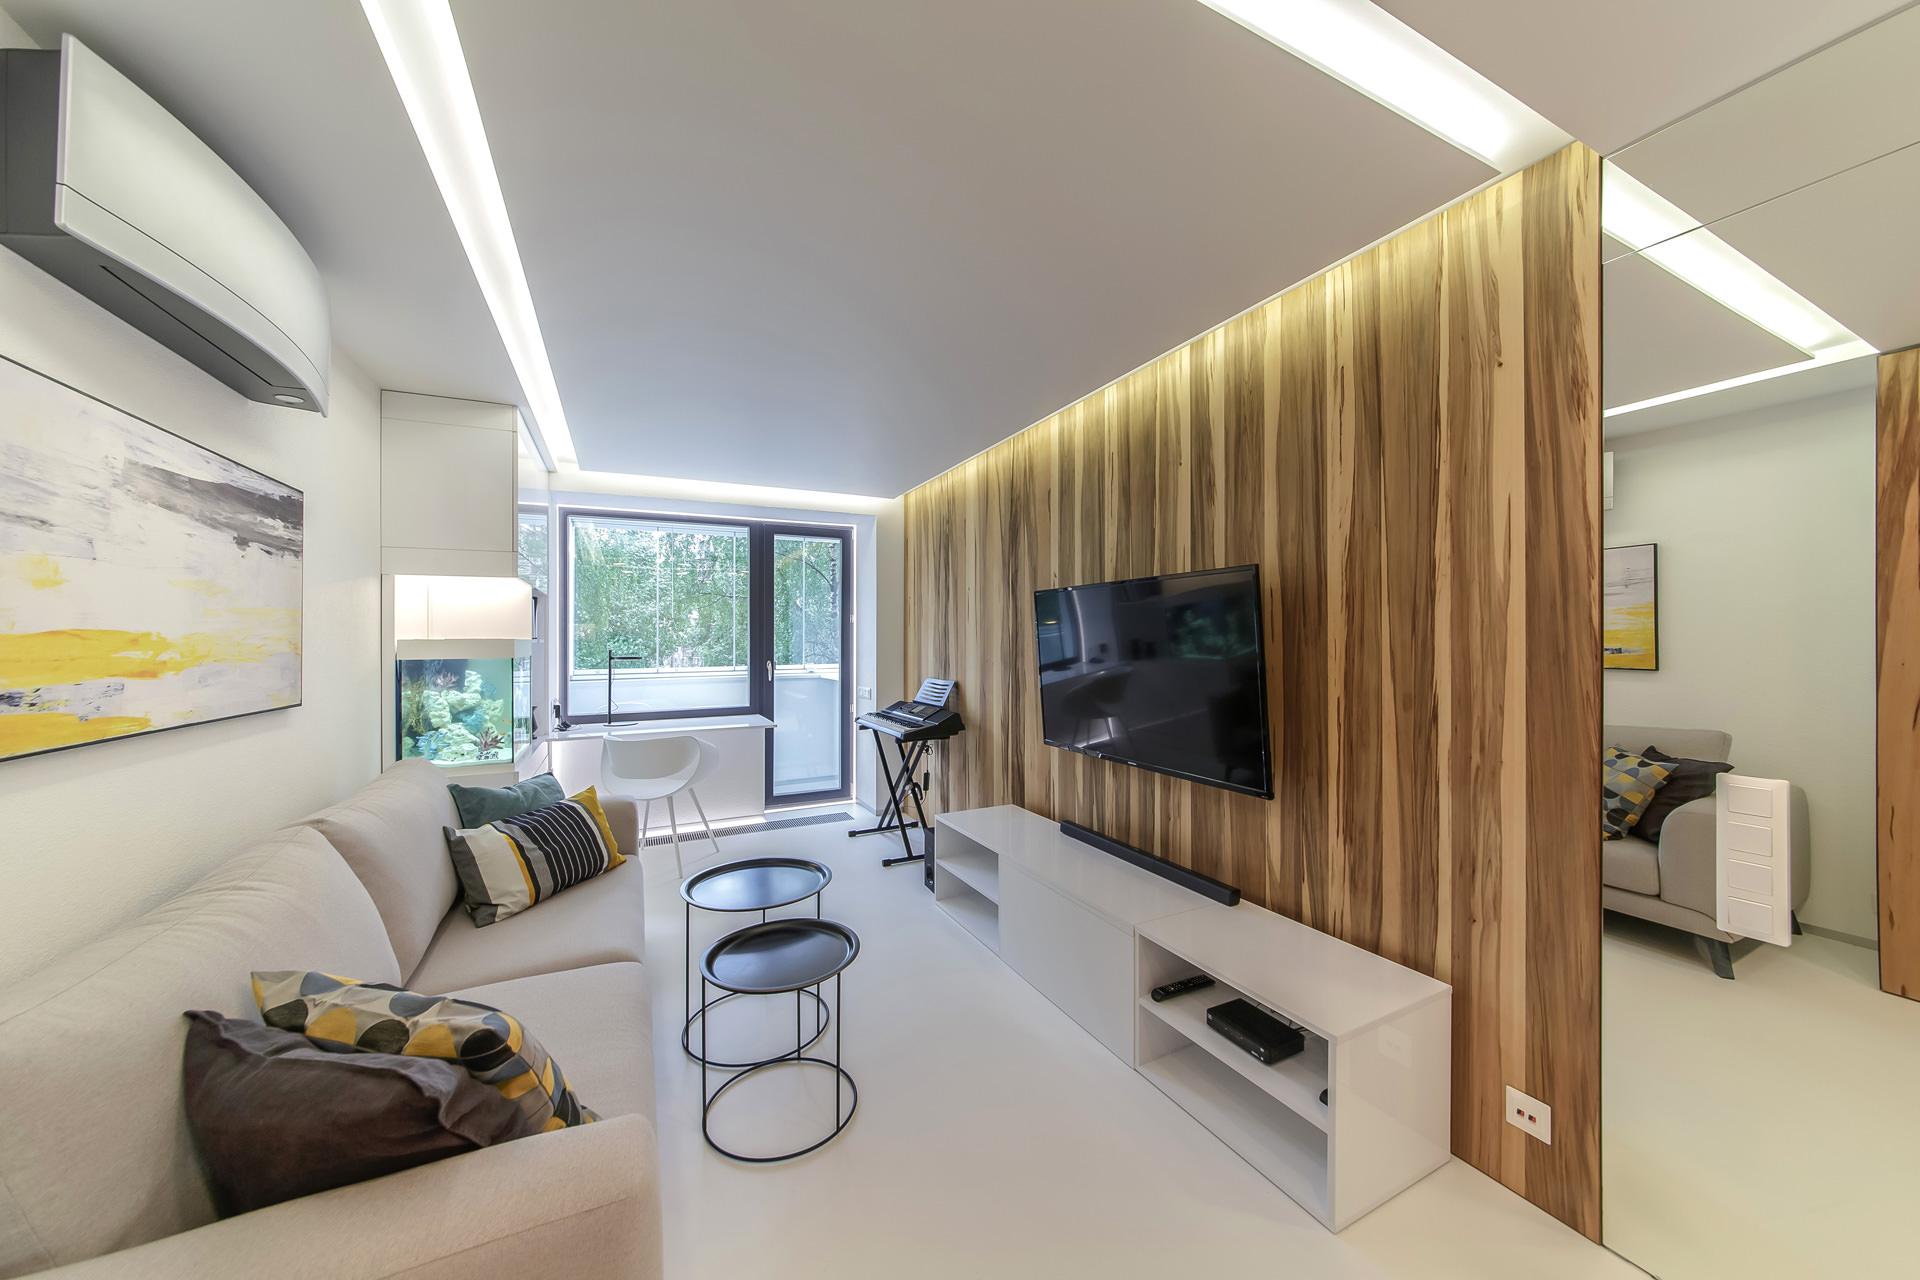 Квартирный вопрос-передача на нтв-дизайн квартир-фото